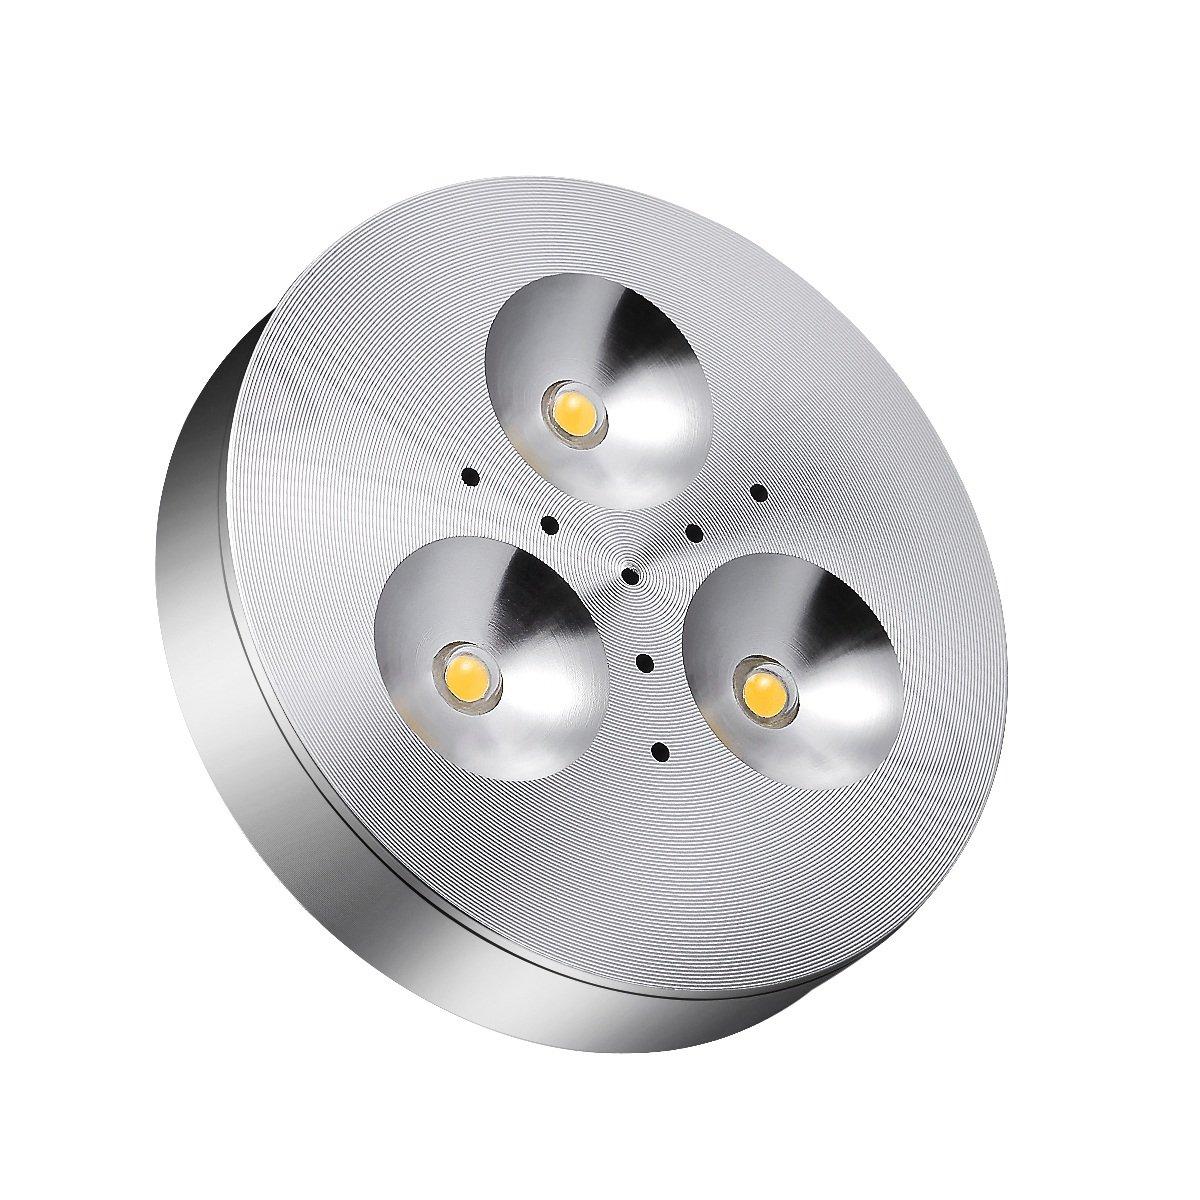 TryLight LED Under Cabinet Lighting 240lm Under Counter Light Closet Lighiting DC 12V Cabinet Light for Kitchen, Shelf, Shop and Exhibition Wardrobe 3000K Warm White (1 Pack)